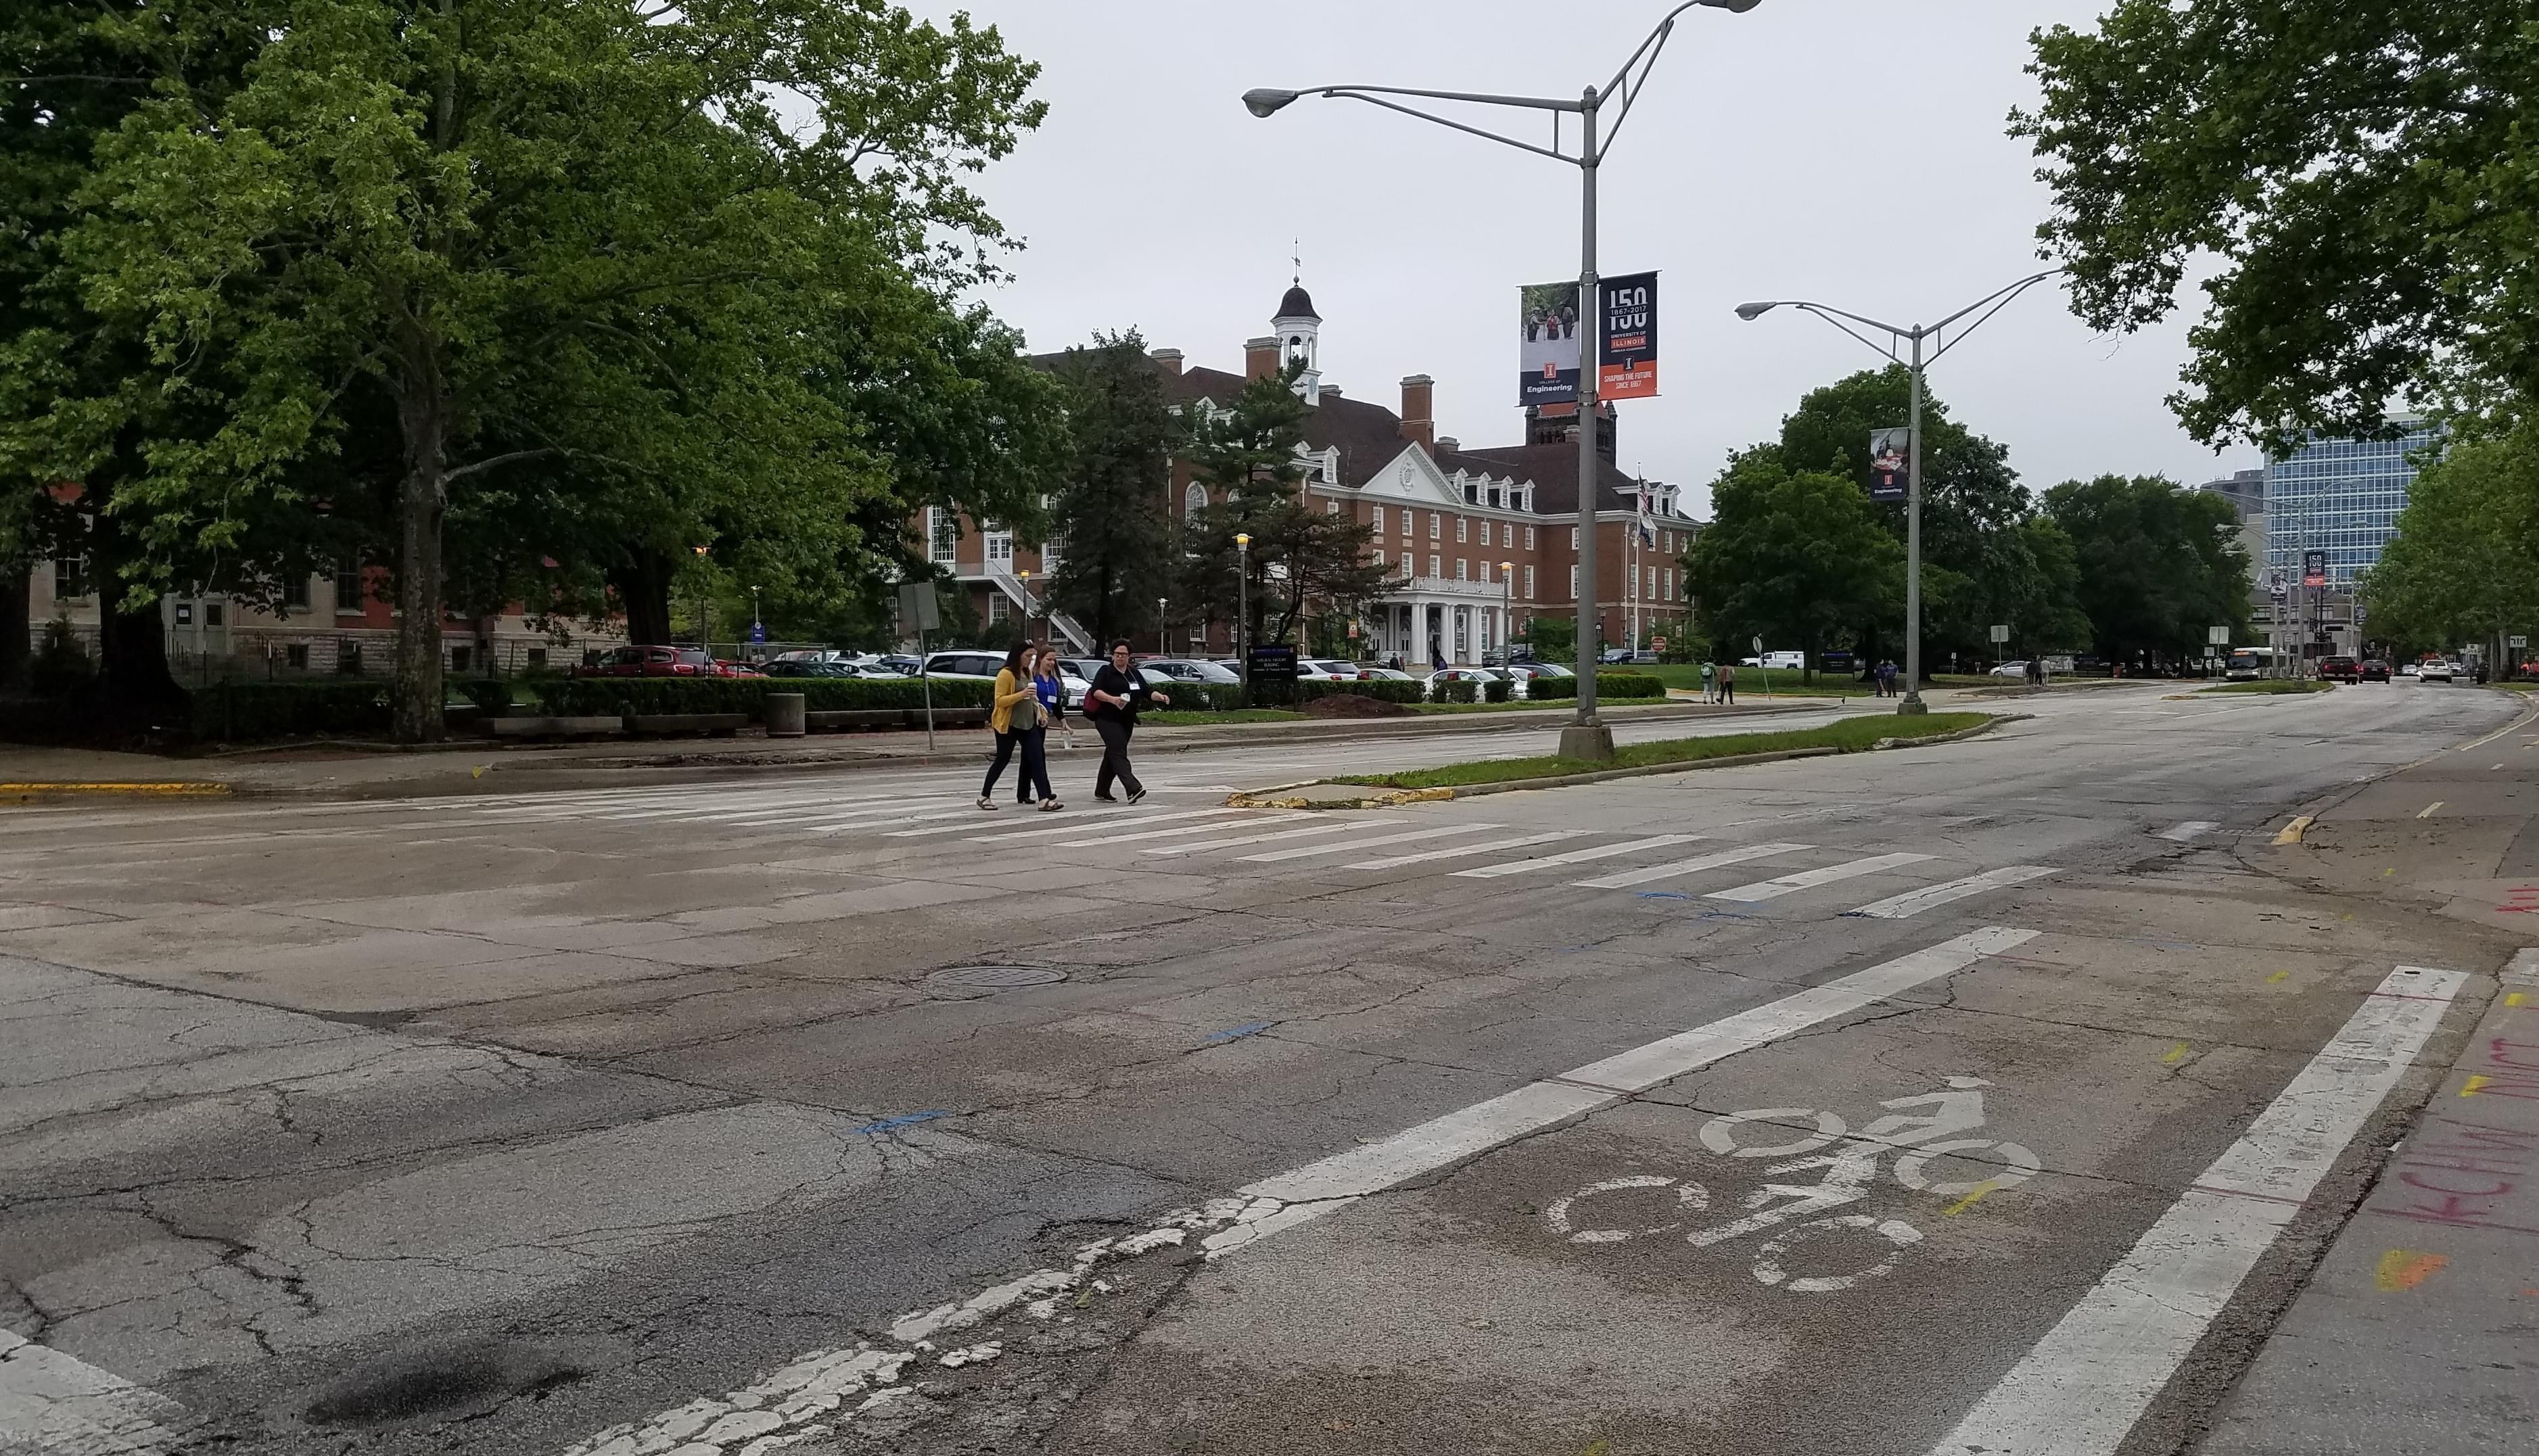 A view of Green Street near Wright Street in Urbana.